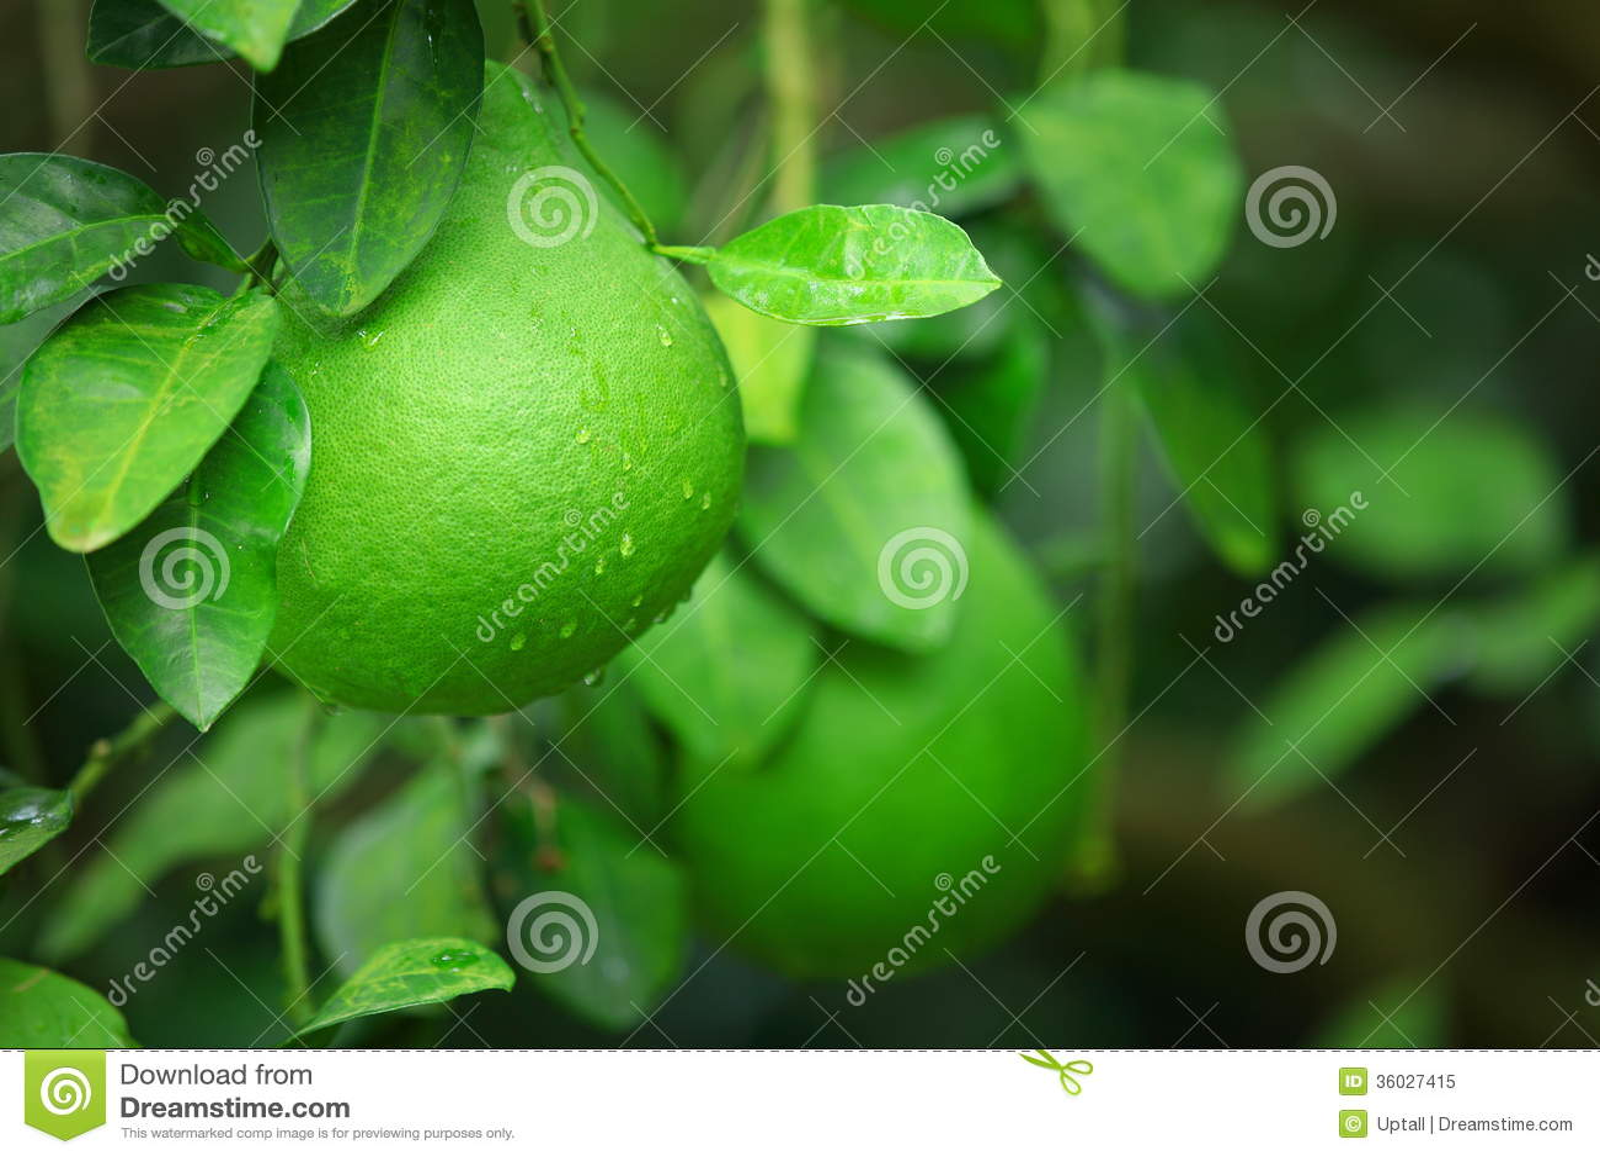 Green shaddock fruit stock image. Image of fresh ...